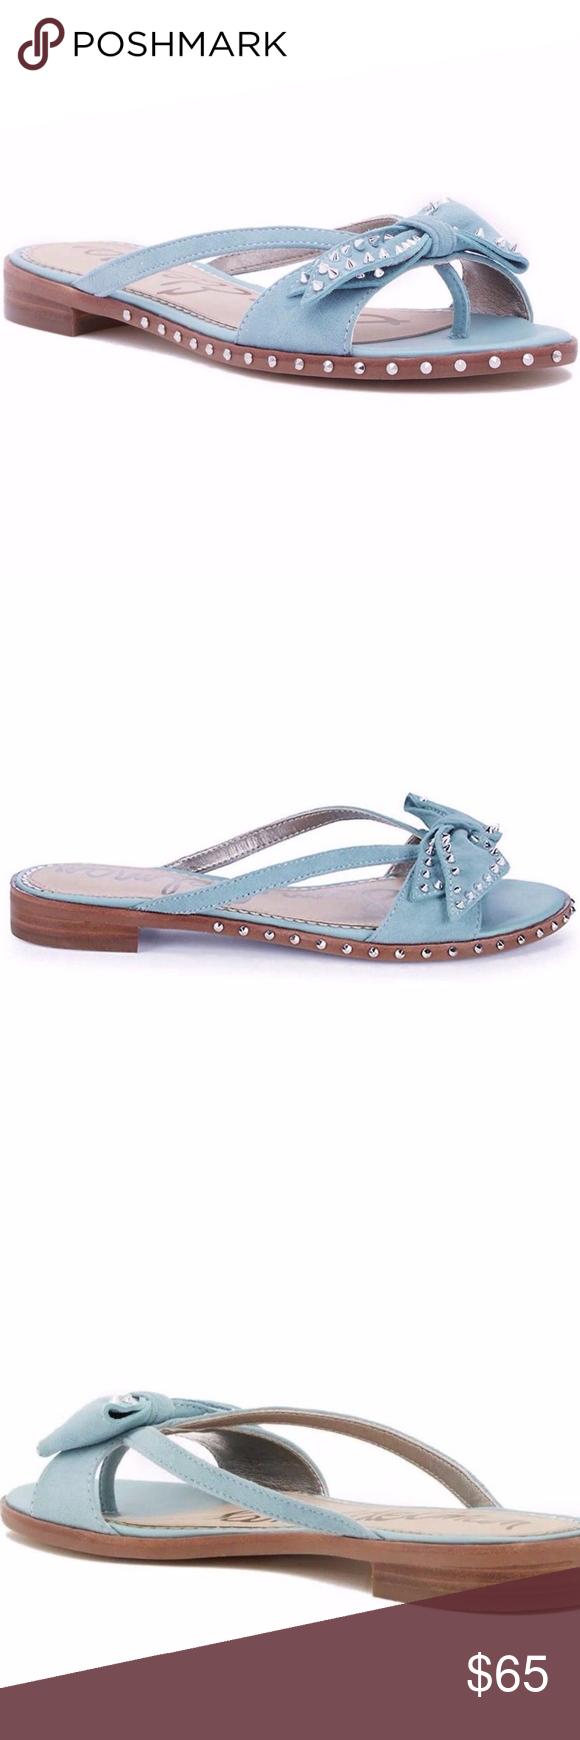 9aea48f969d8 Sam Edelman Dariel Bow Studded Sandals Size 10 ANTHROPOLOGIE Sam Edelman  Dariel Thong Sandals Blue Size